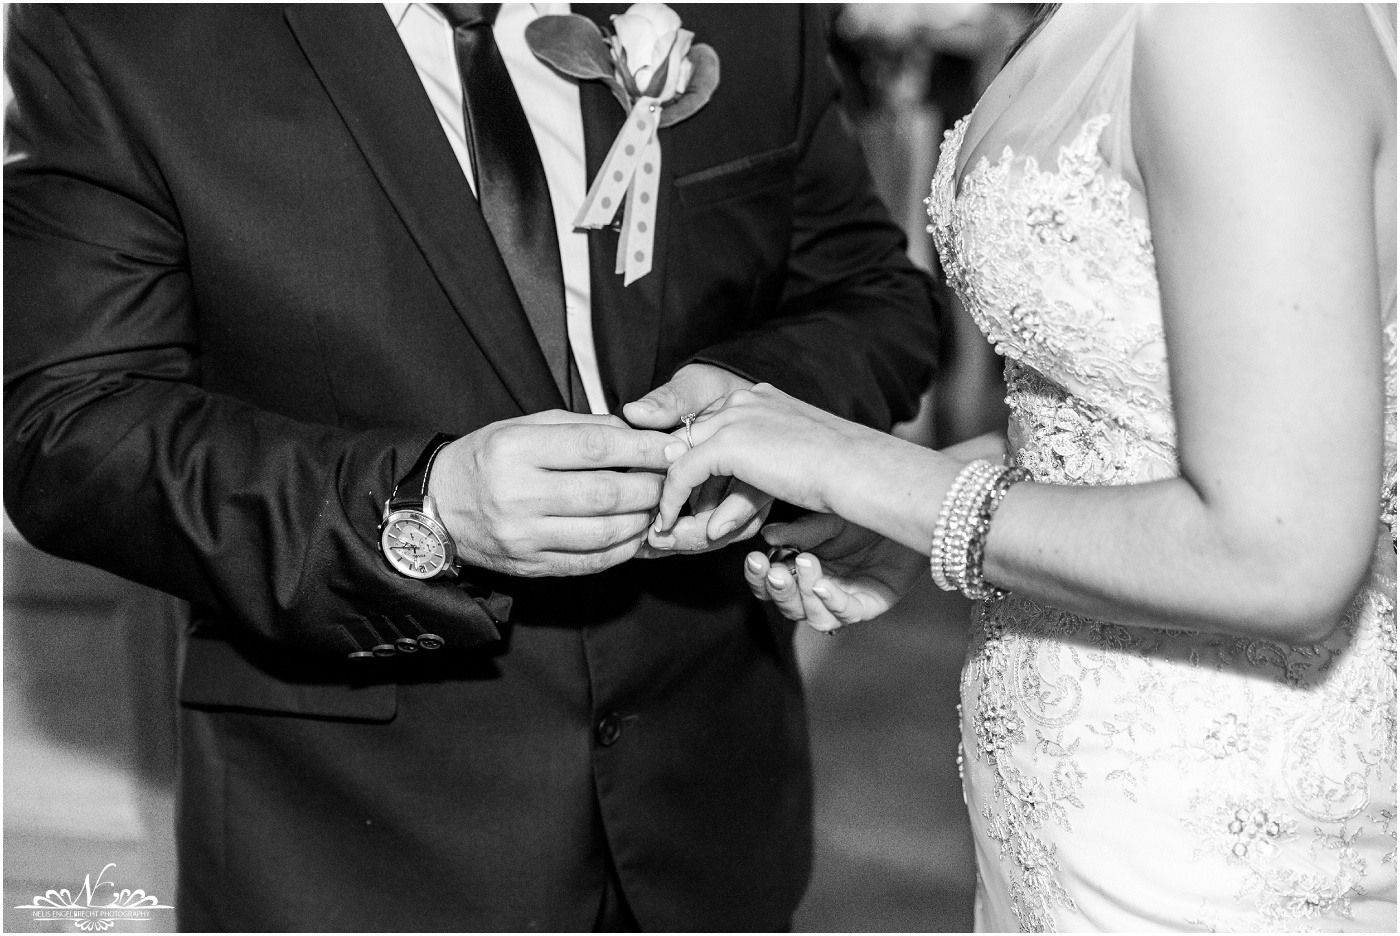 Eensgezind-Wedding-Photos-Nelis-Engelbrecht-Photography-066